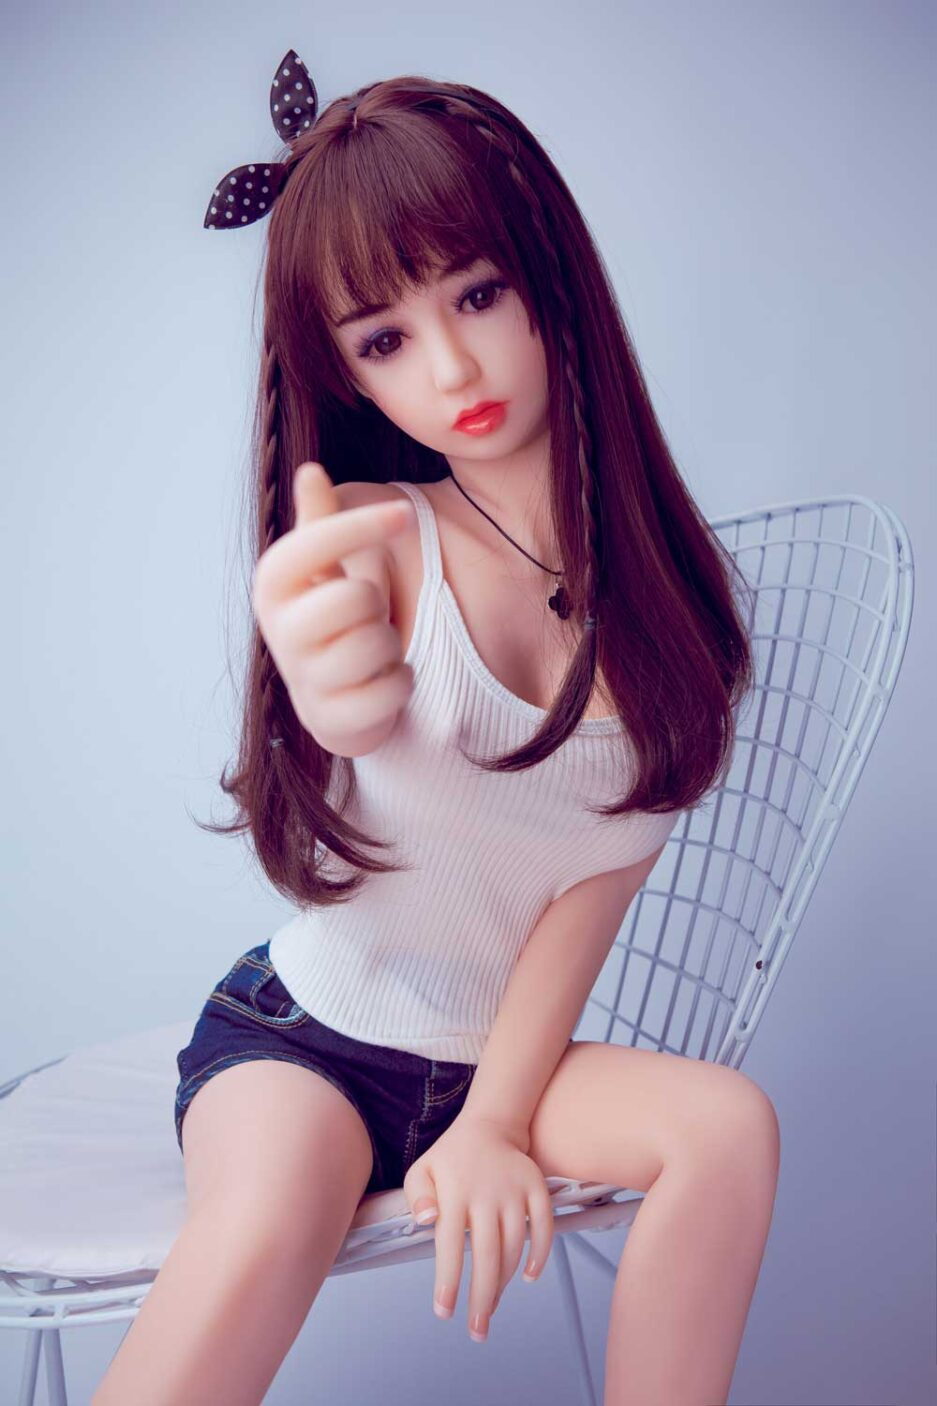 Mini sex doll than heart